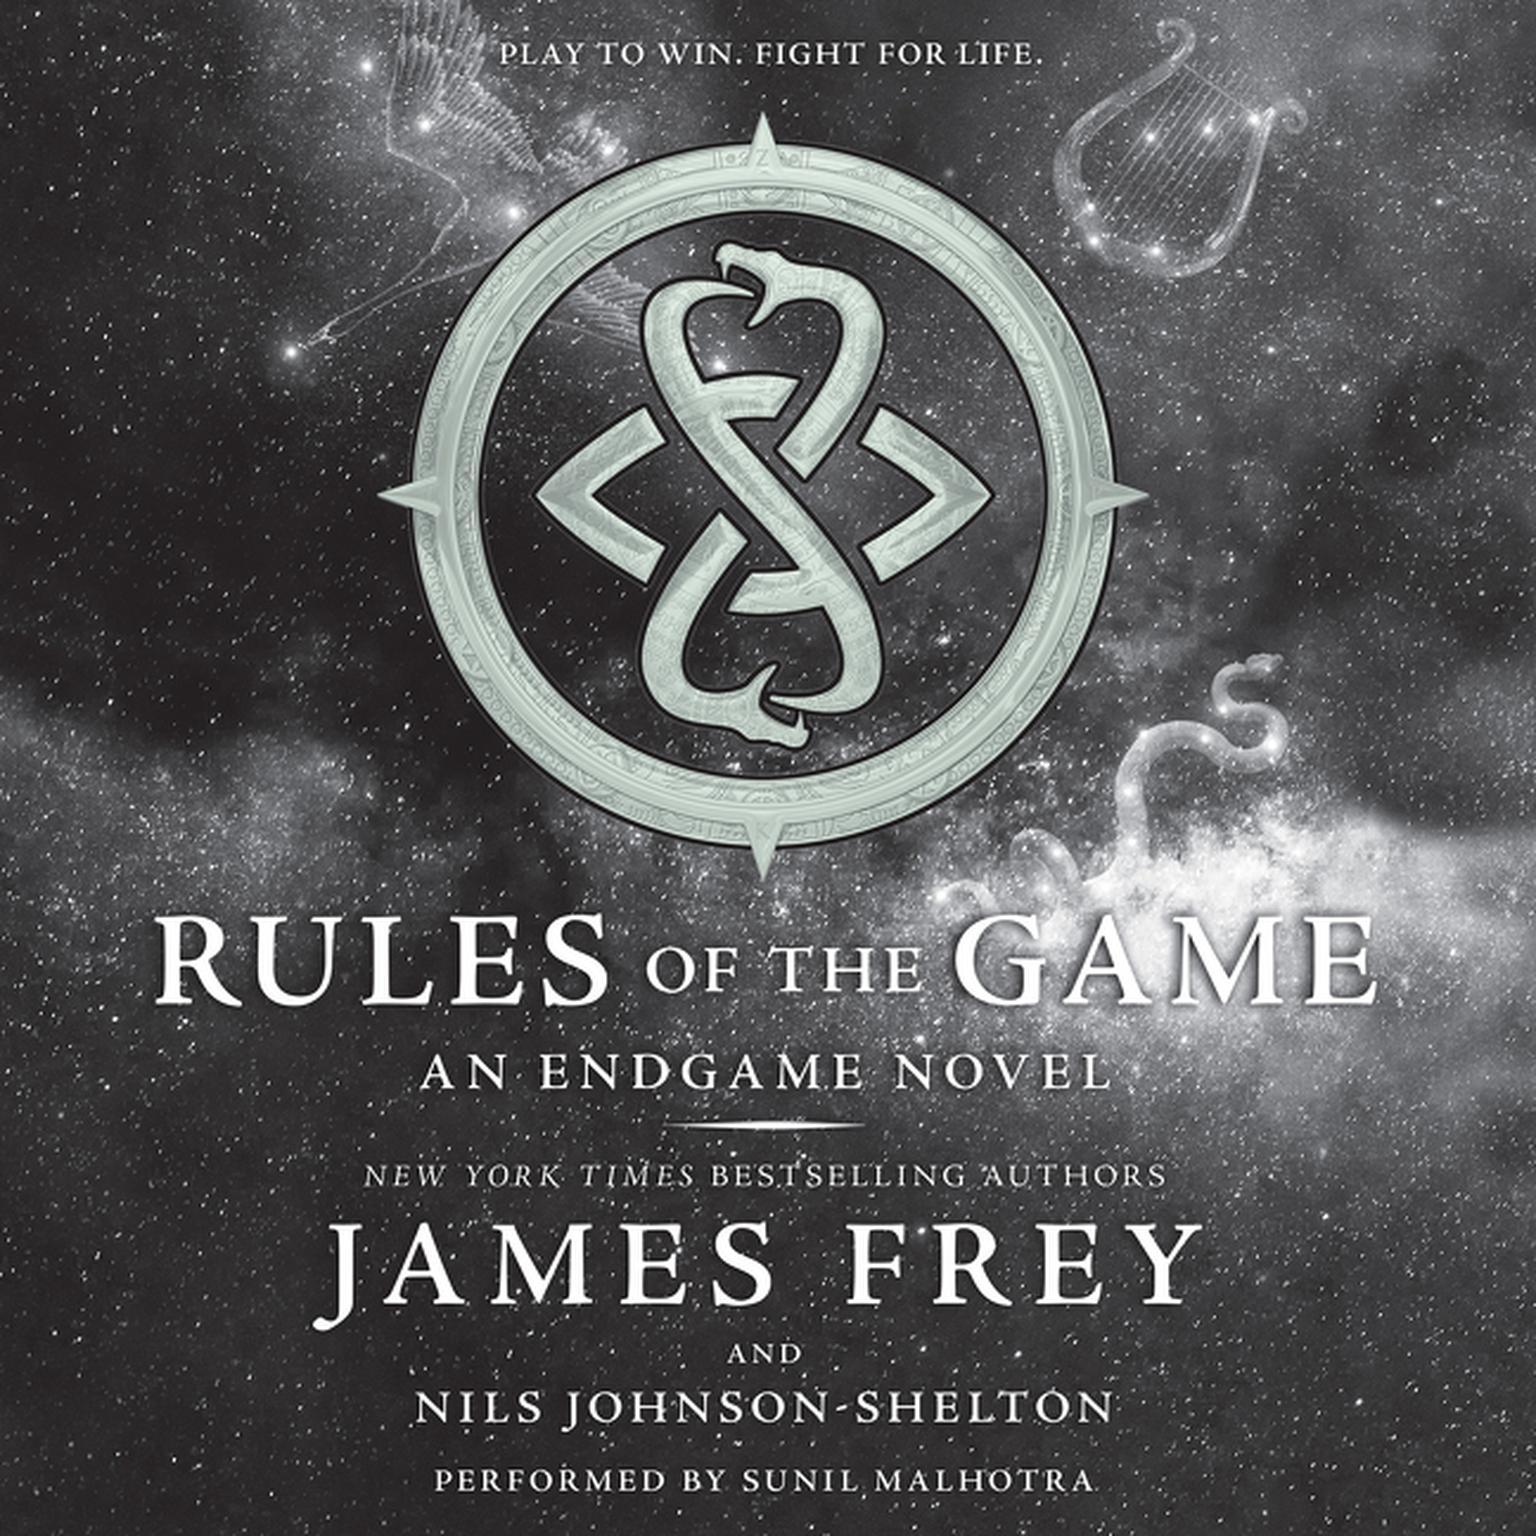 Printable Endgame: Rules of the Game: An Endgame Novel Audiobook Cover Art